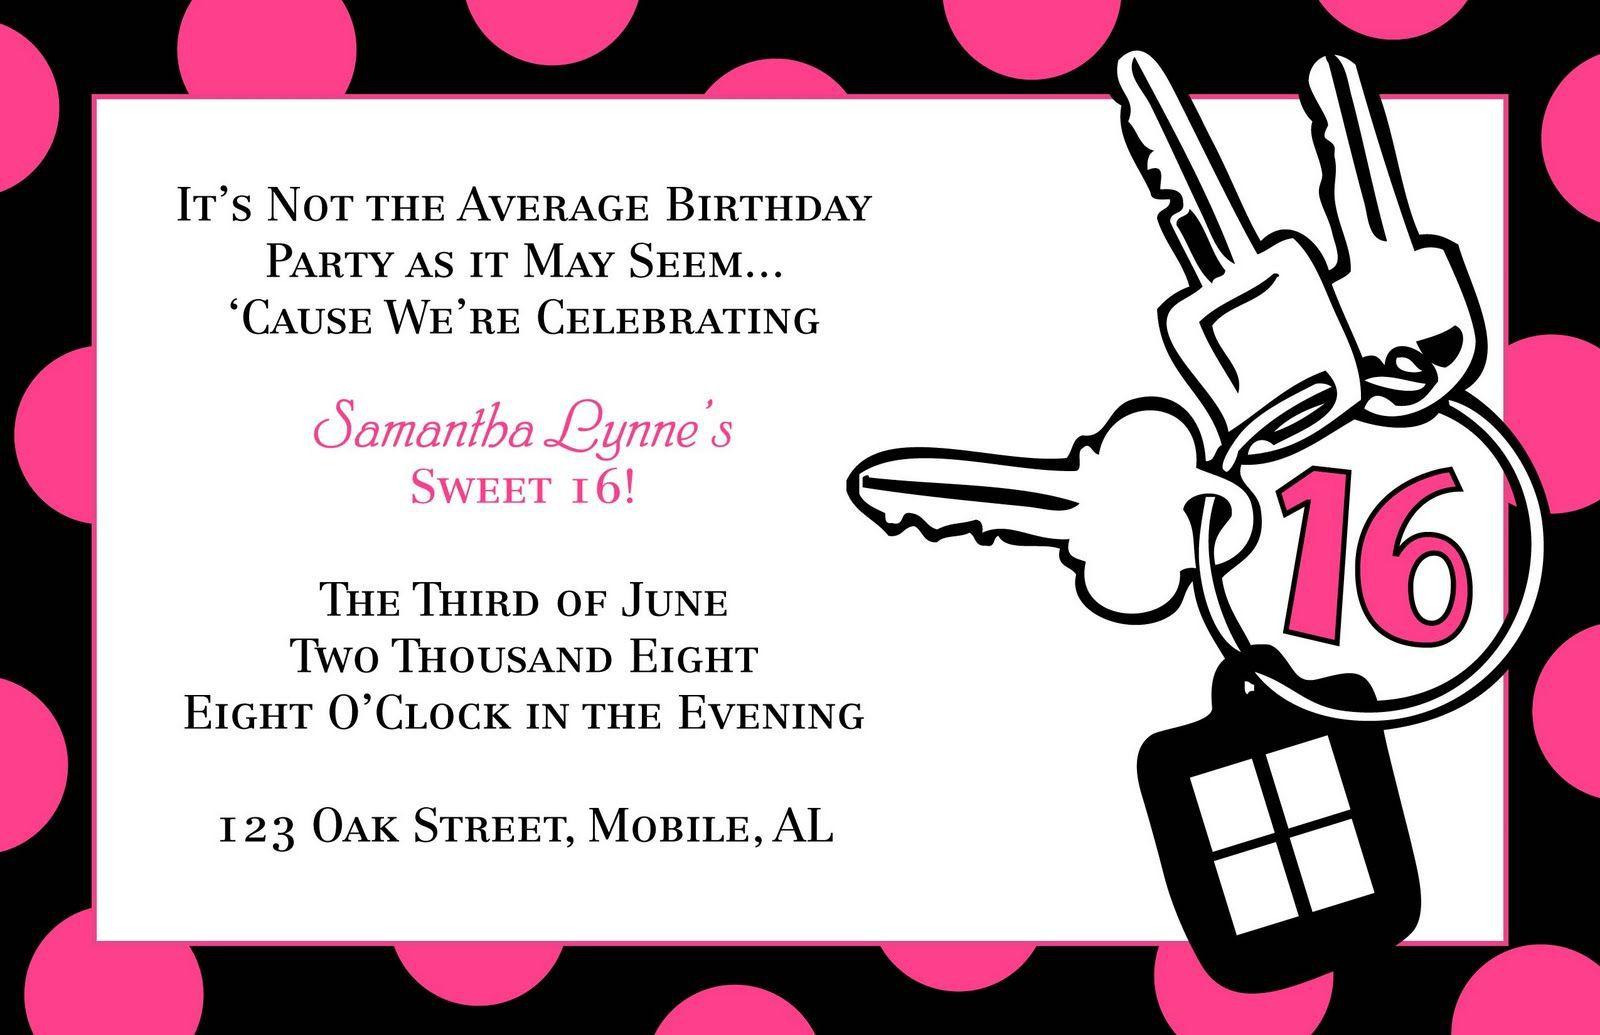 003 Stunning Sweet 16 Invite Template Highest Clarity  Templates Surprise Party Invitation Birthday Free 16thFull